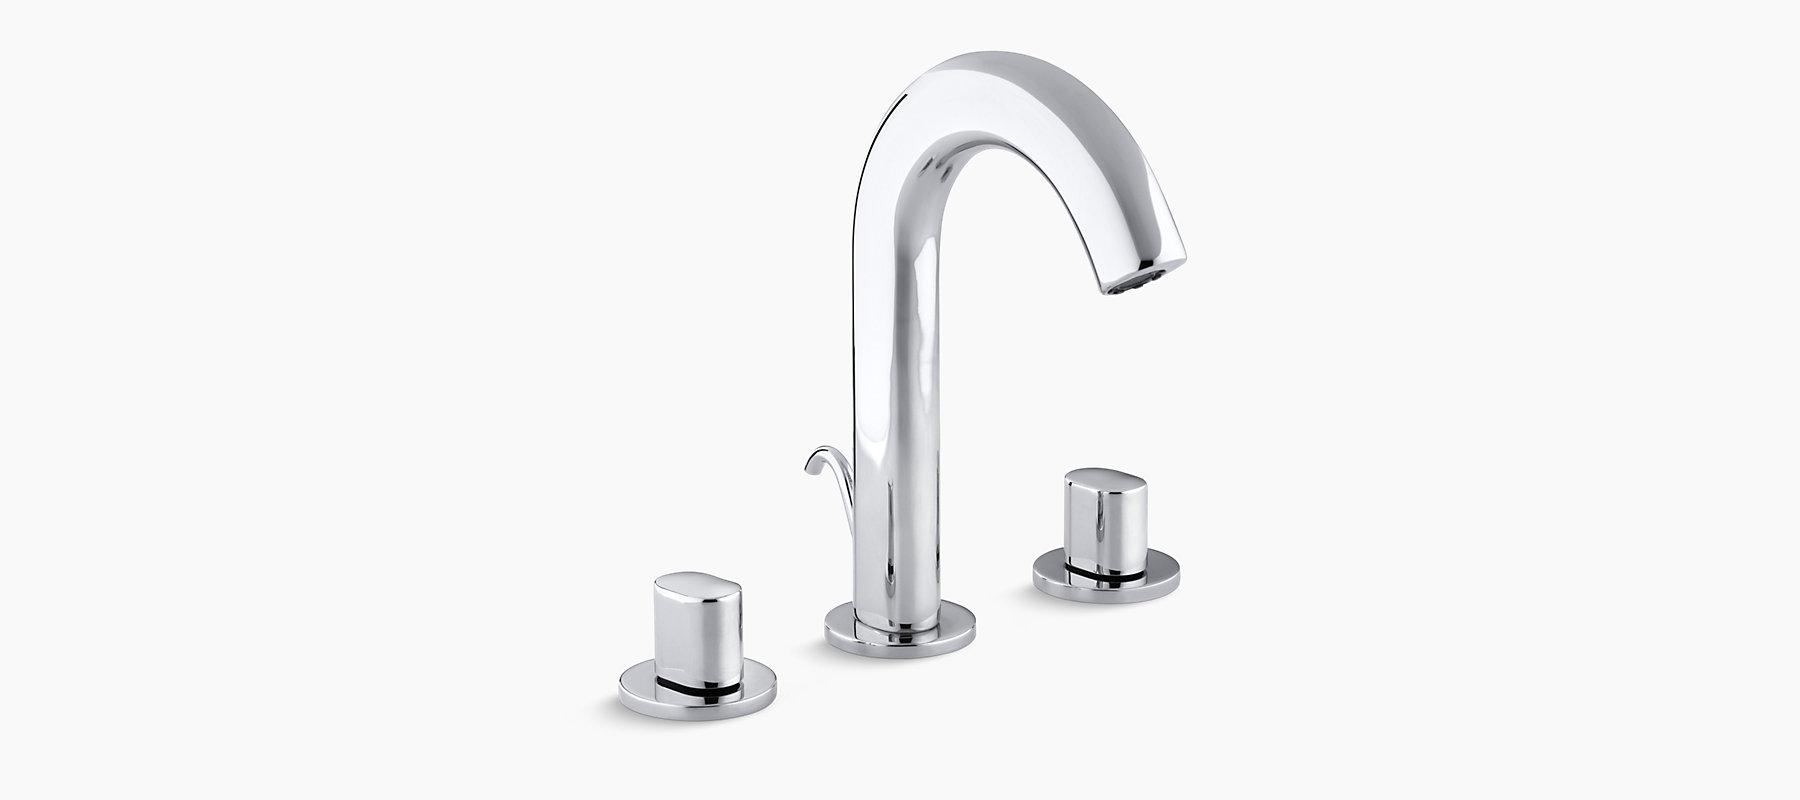 Oblo Widespread Bathroom Sink Faucet K 10086 9 Kohler